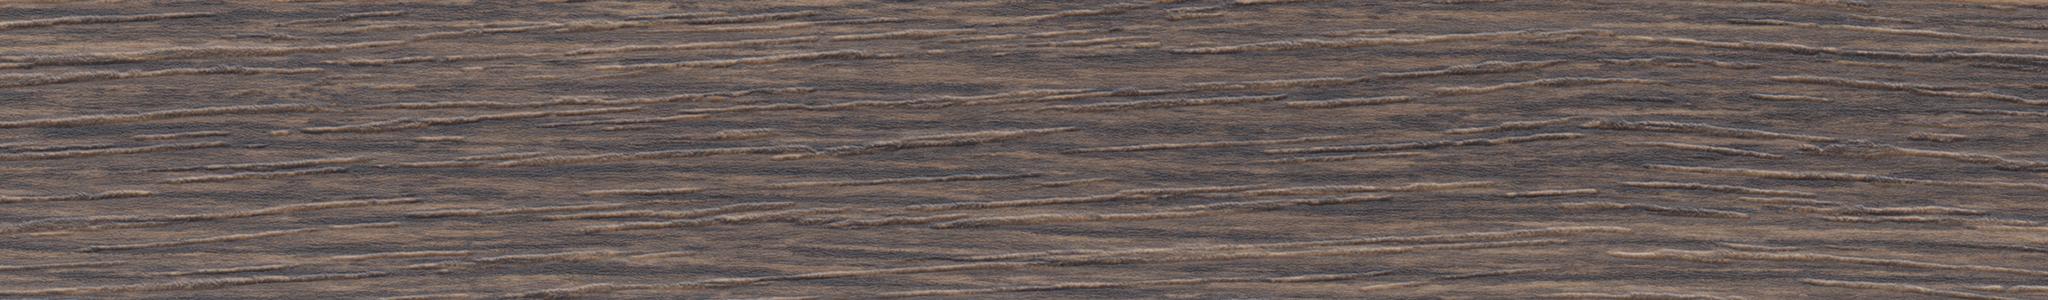 HD 240234 ABS Edge Dark Springfield Oak Pore Softmatt